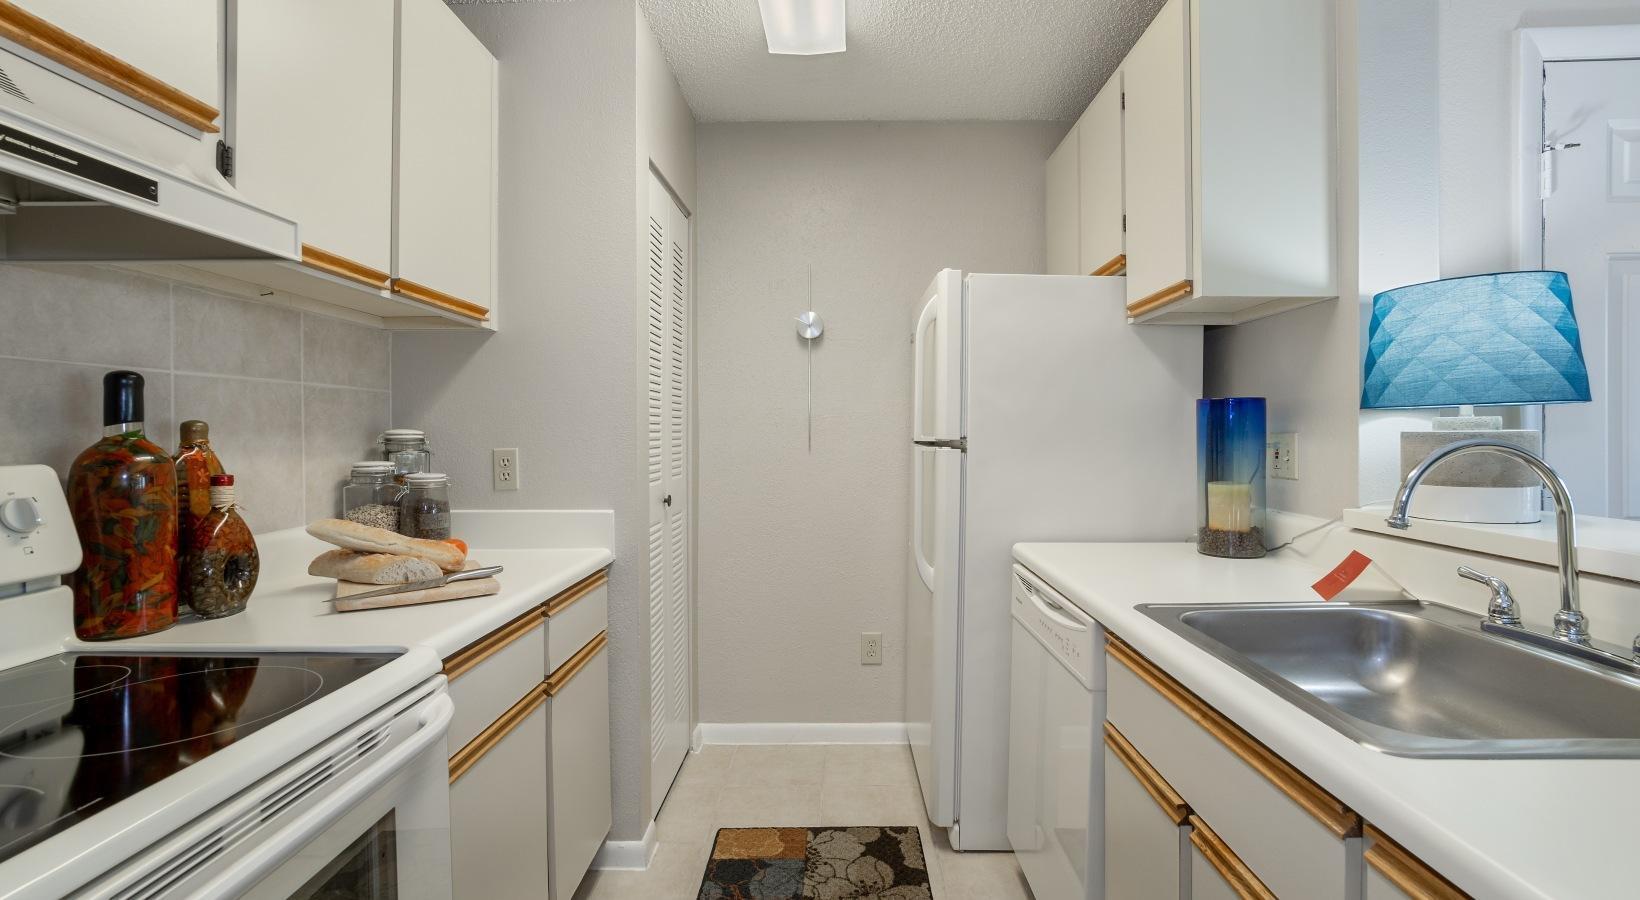 520 Terraceview Cove #1-202, Altamonte Springs, FL - 1,678 USD/ month